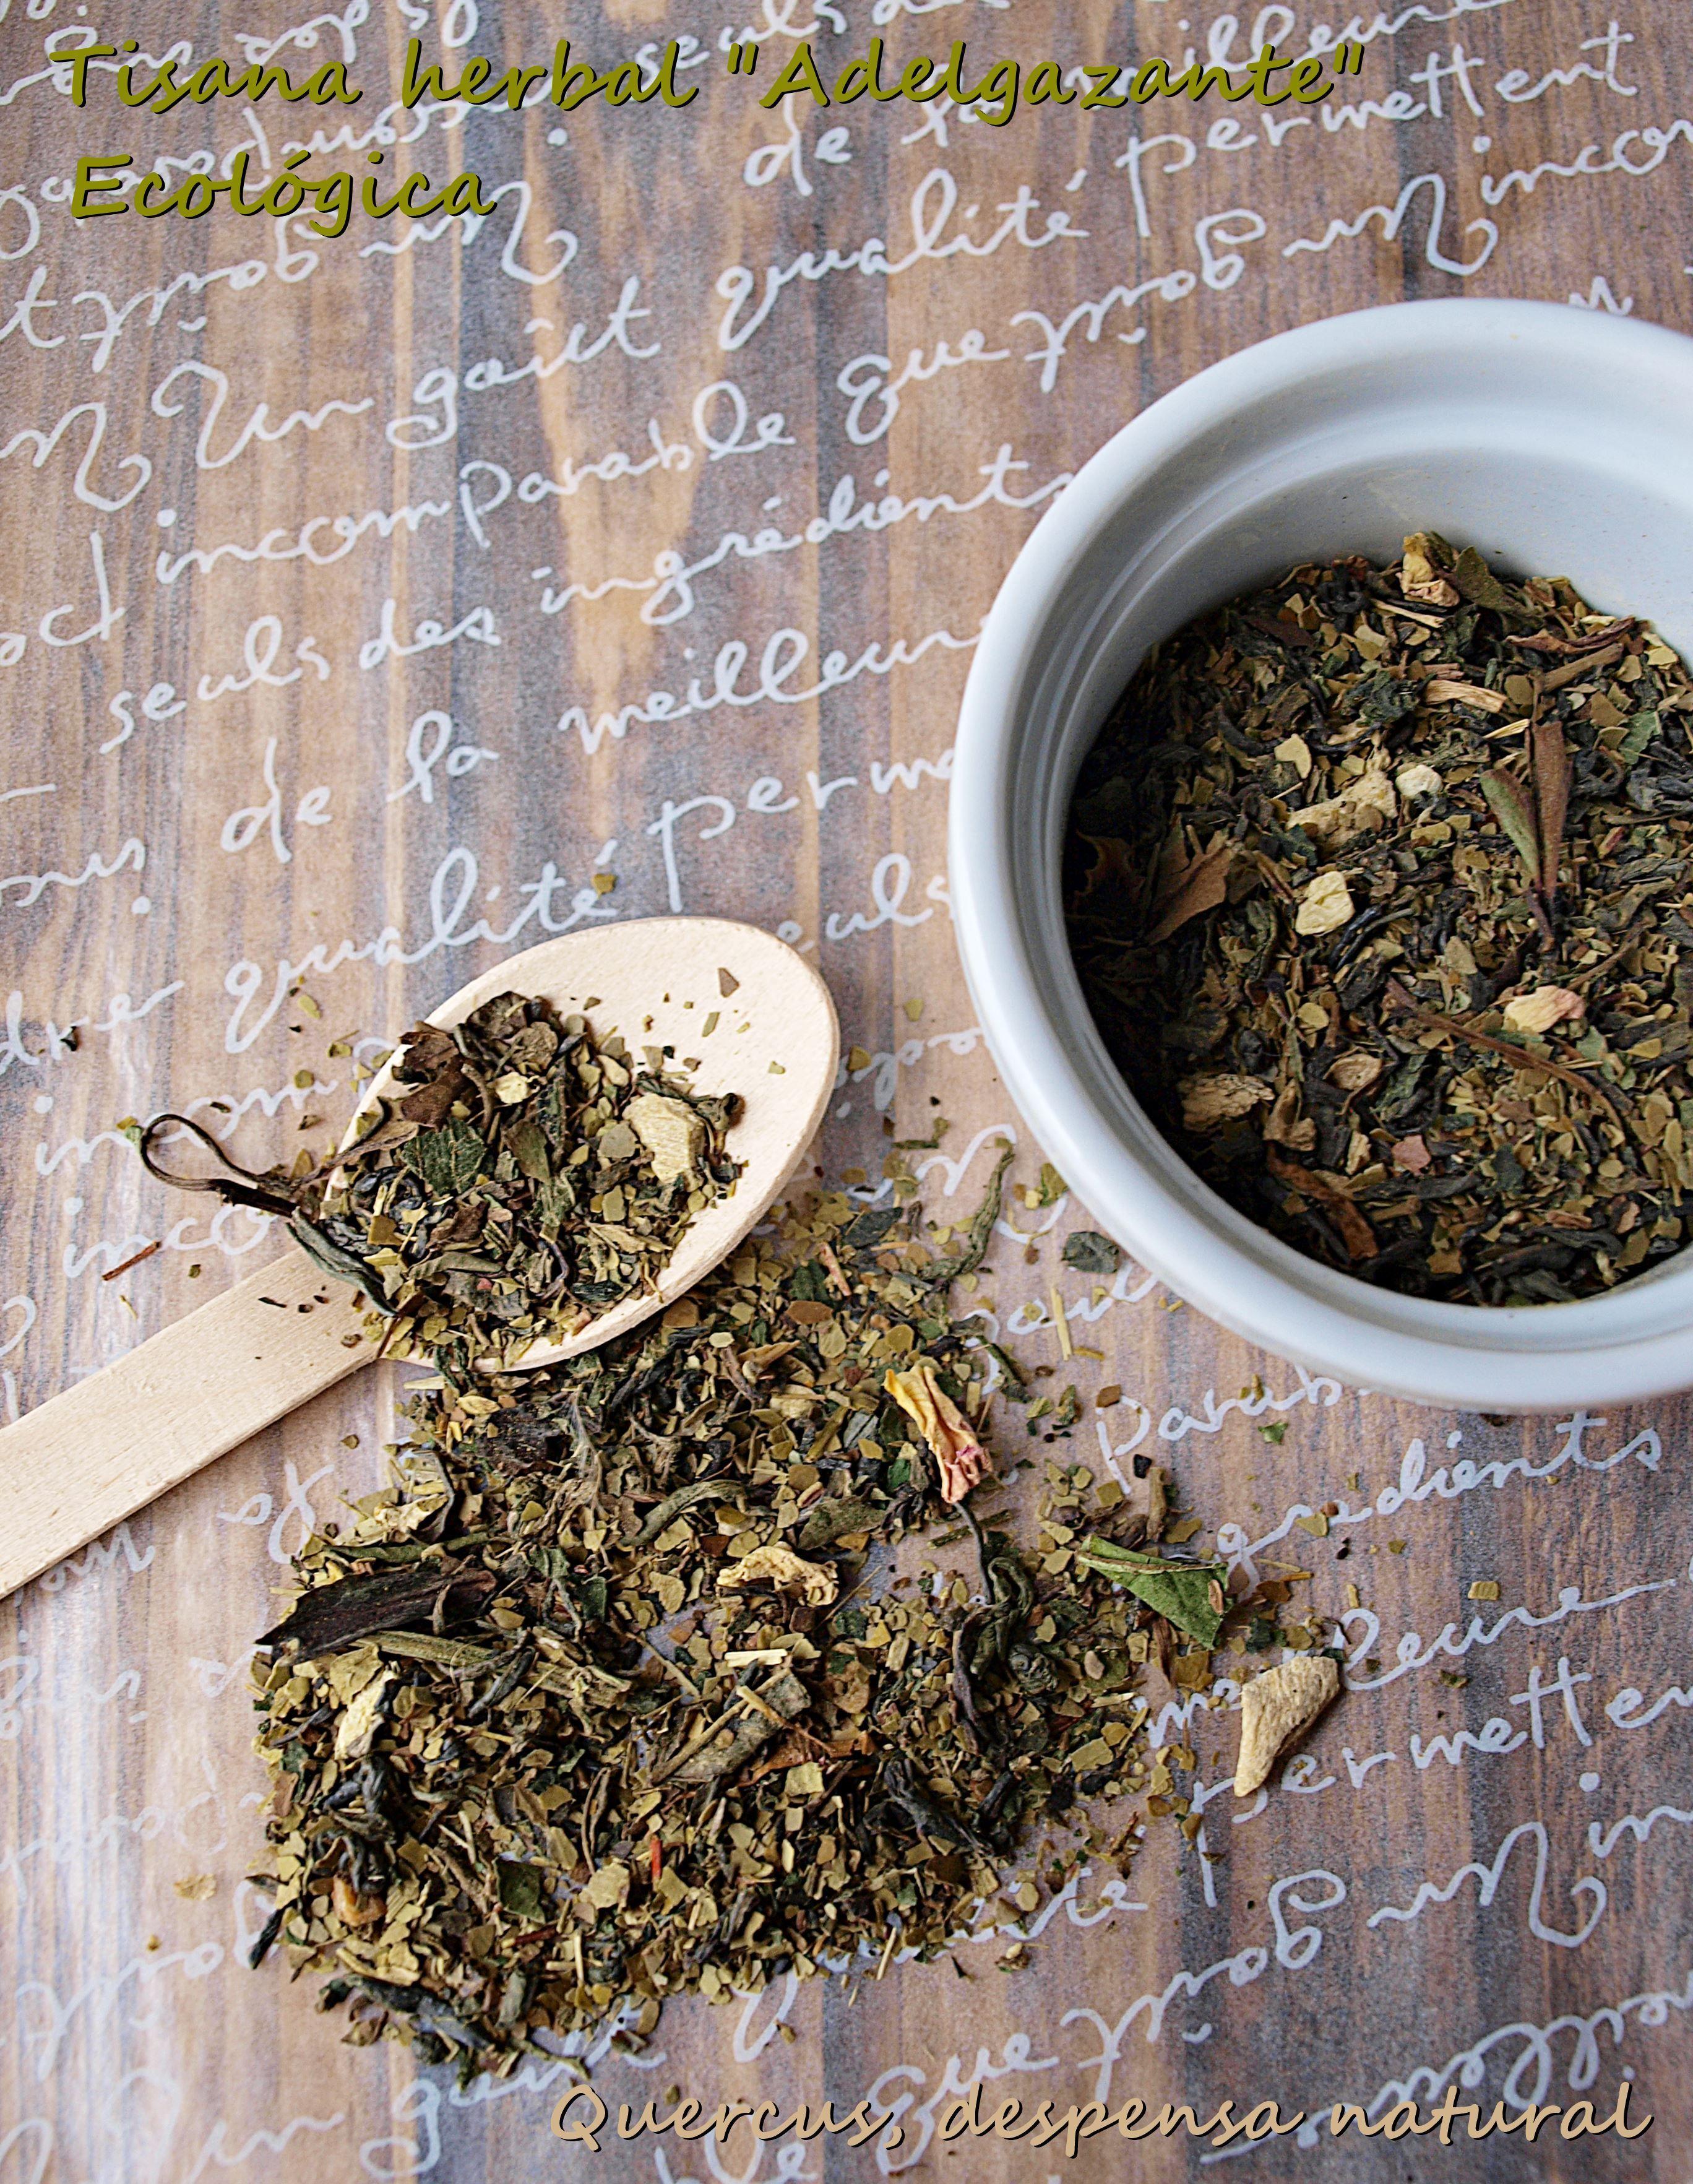 "Tisana herbal ""Adelgazante"" Ecológico Mate verde, té verde Chun Mee, Darjeeling verde, té blanco Pai Mu Tan, China Oolong, trozos de jengibre, rooibos verde, hierba tulsi, hojas de ortiga, hojas de diente de león, aroma natural, acerola berries, hojas de mora, pétalos de rosa"